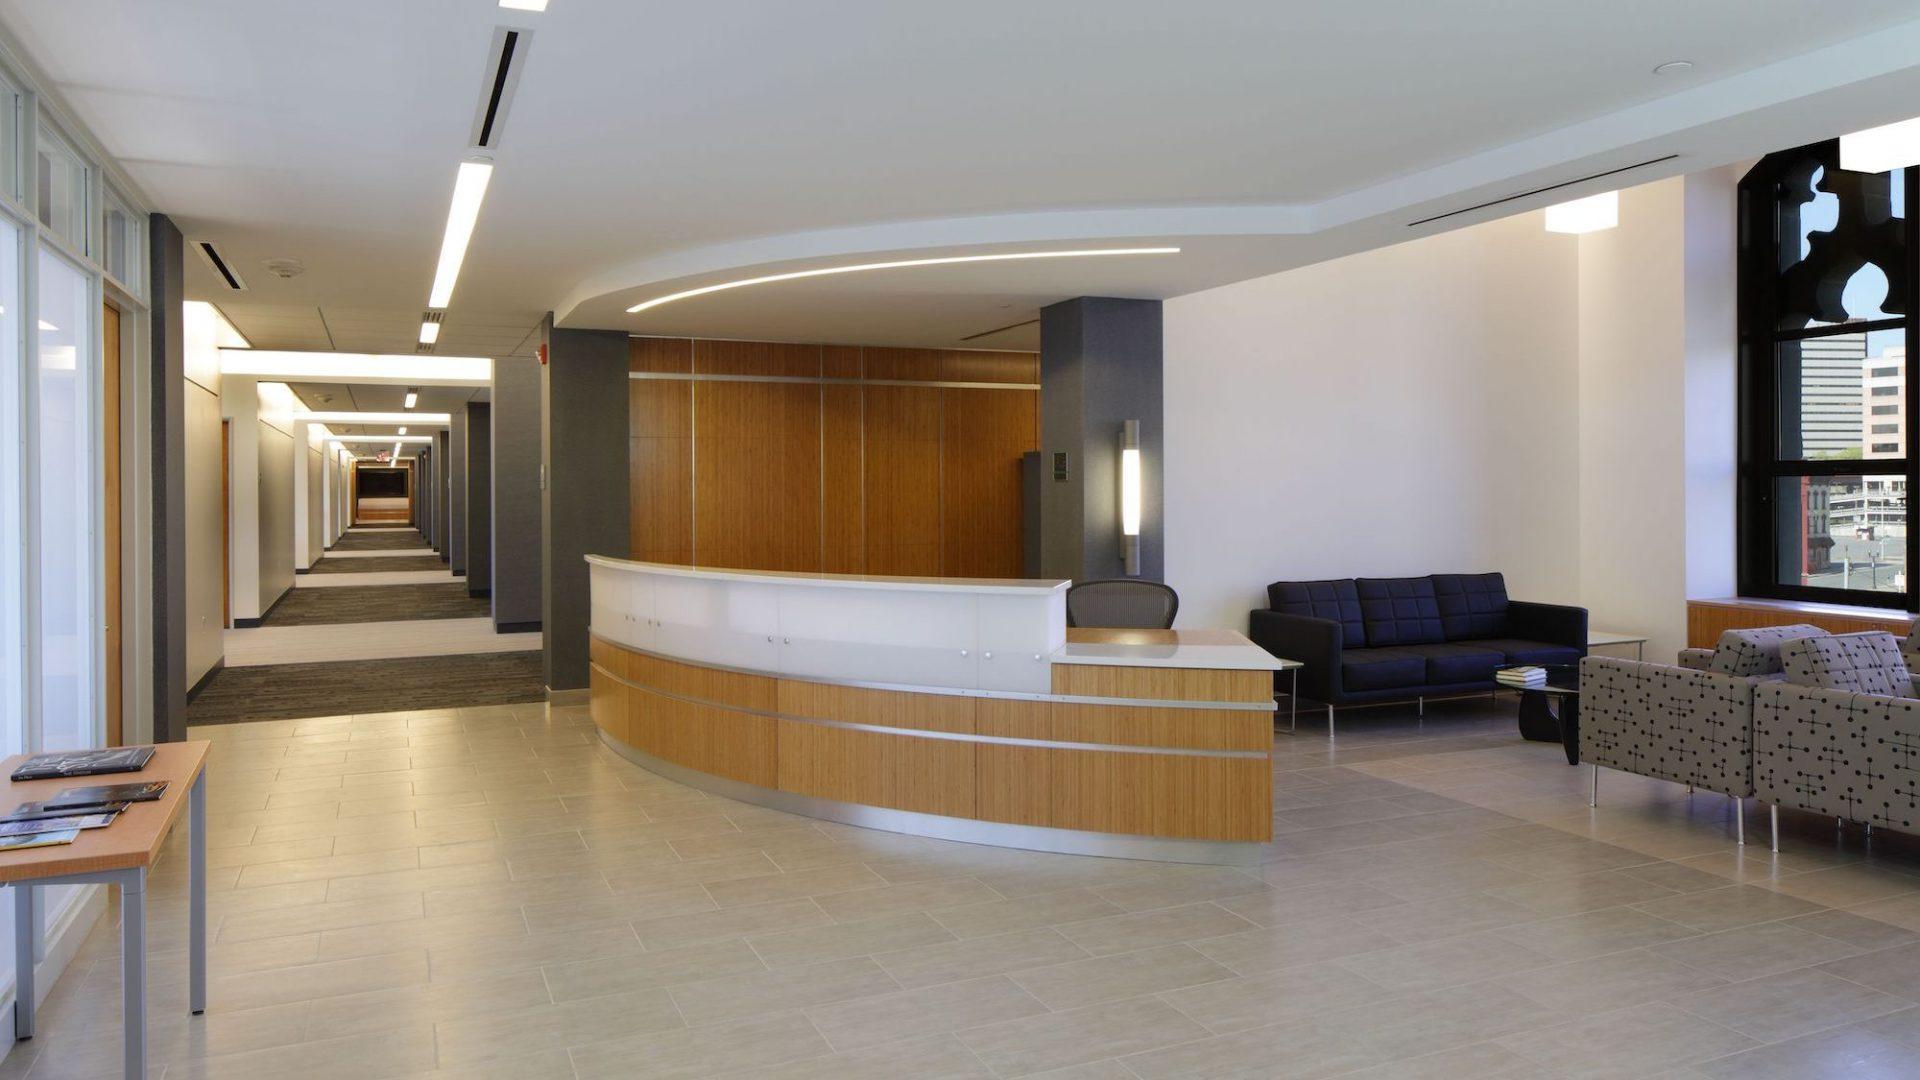 SUNY Plaza renovation